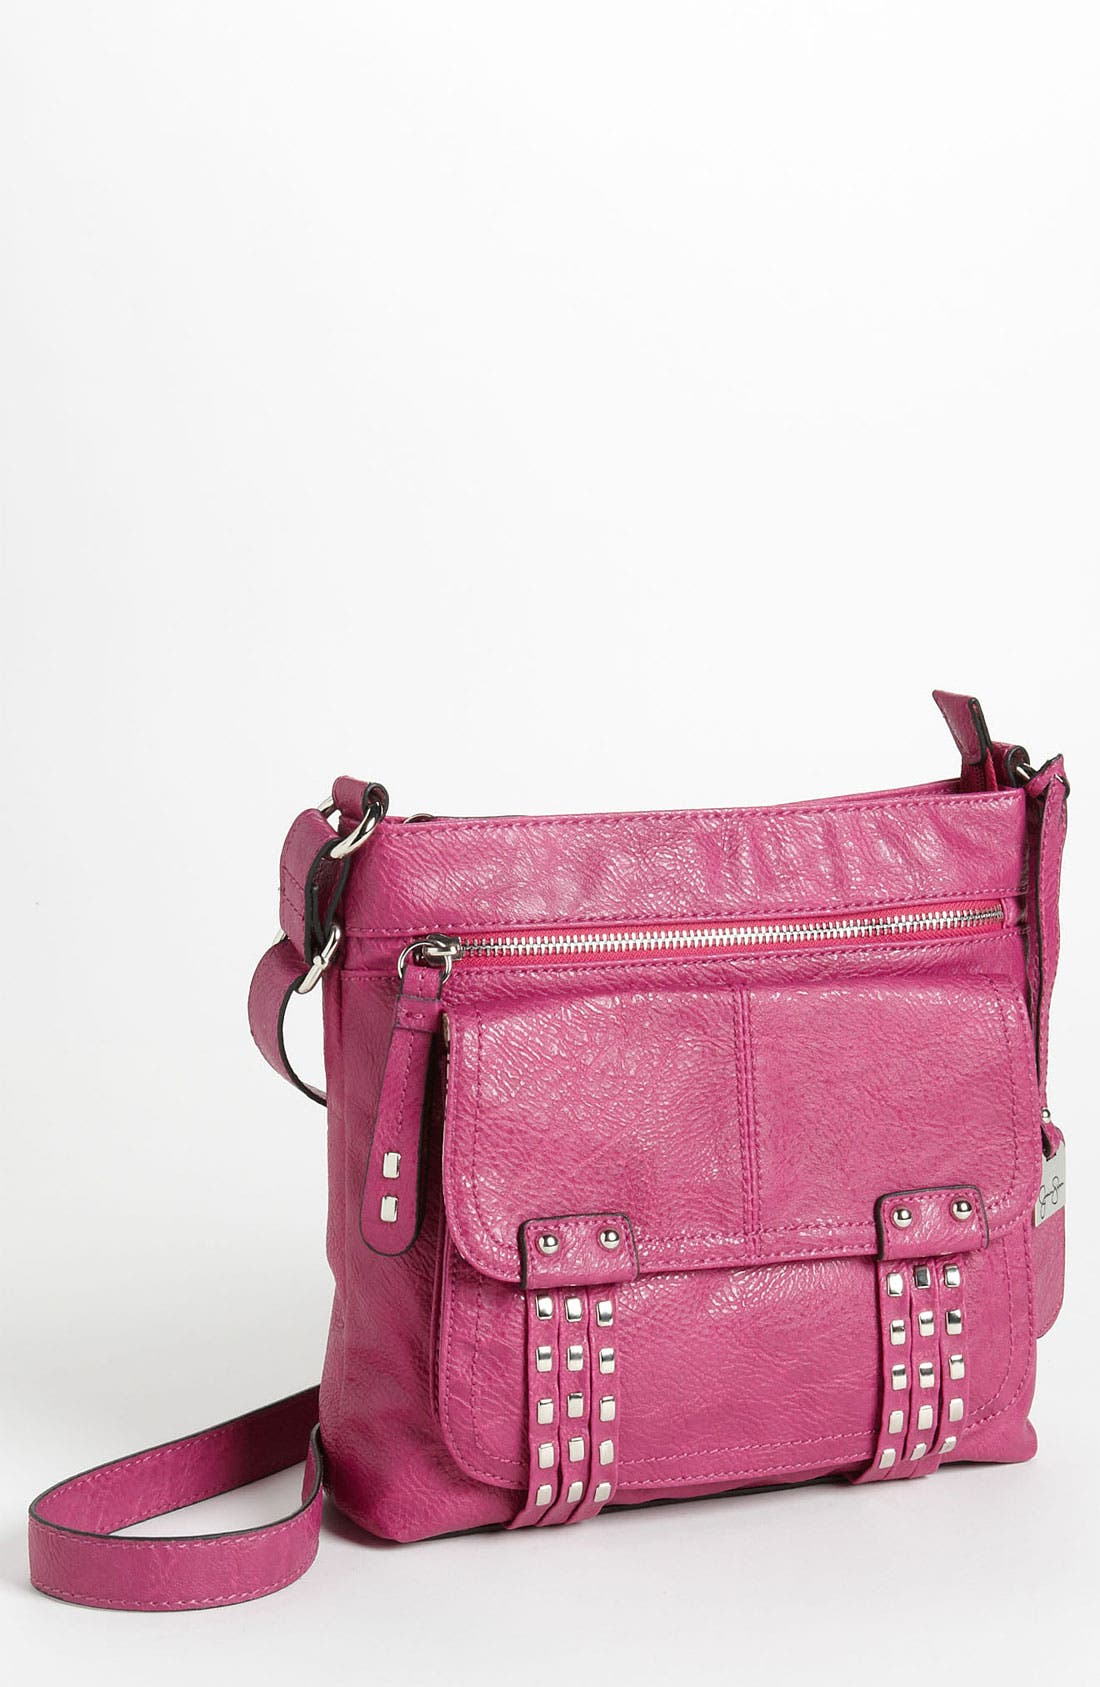 Main Image - Jessica Simpson 'Chelsea' Crossbody Bag